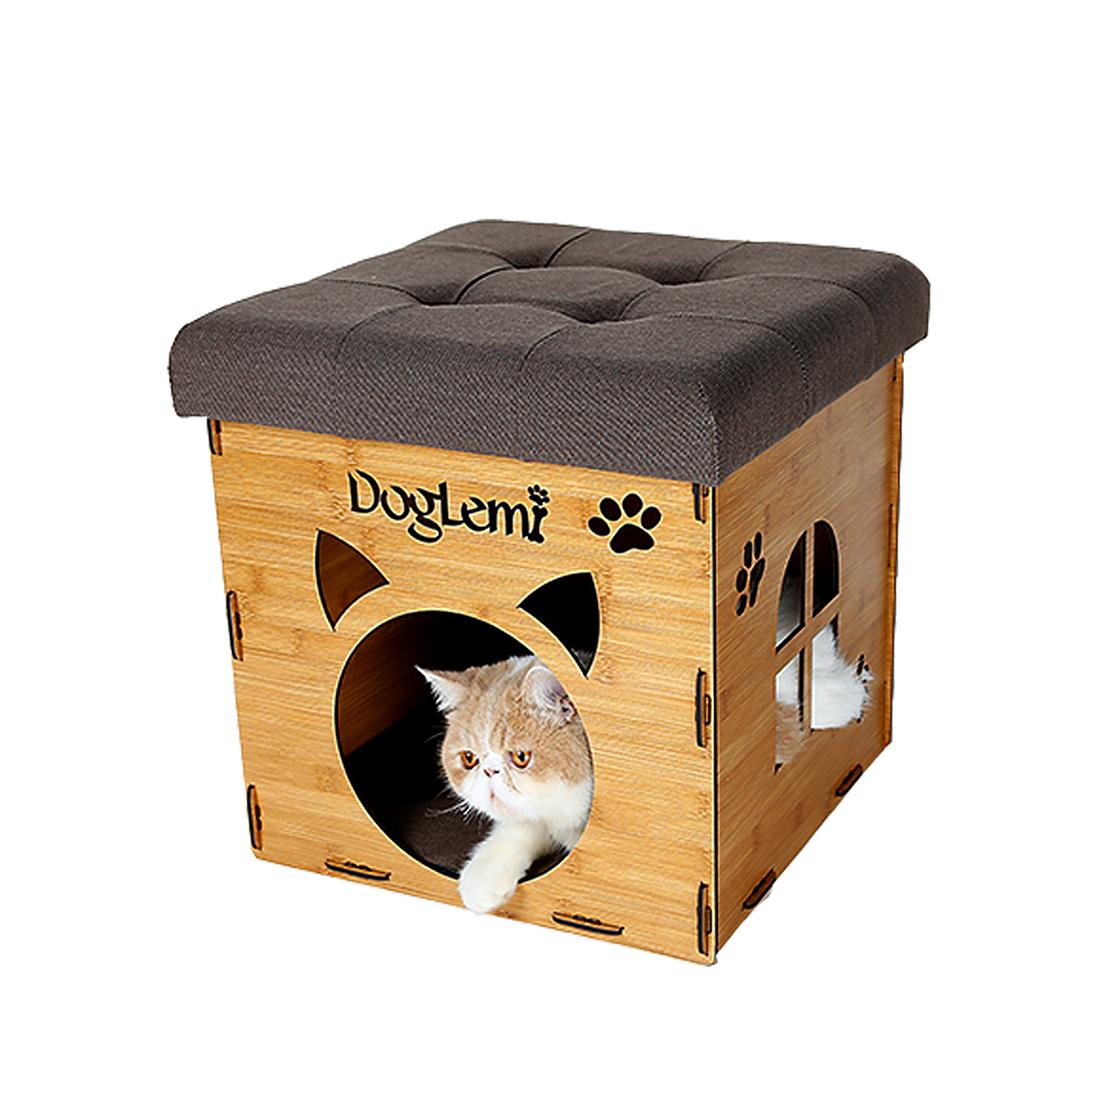 Multi-Function Soft Ottoman Design Cat Cube House Pet Cat...